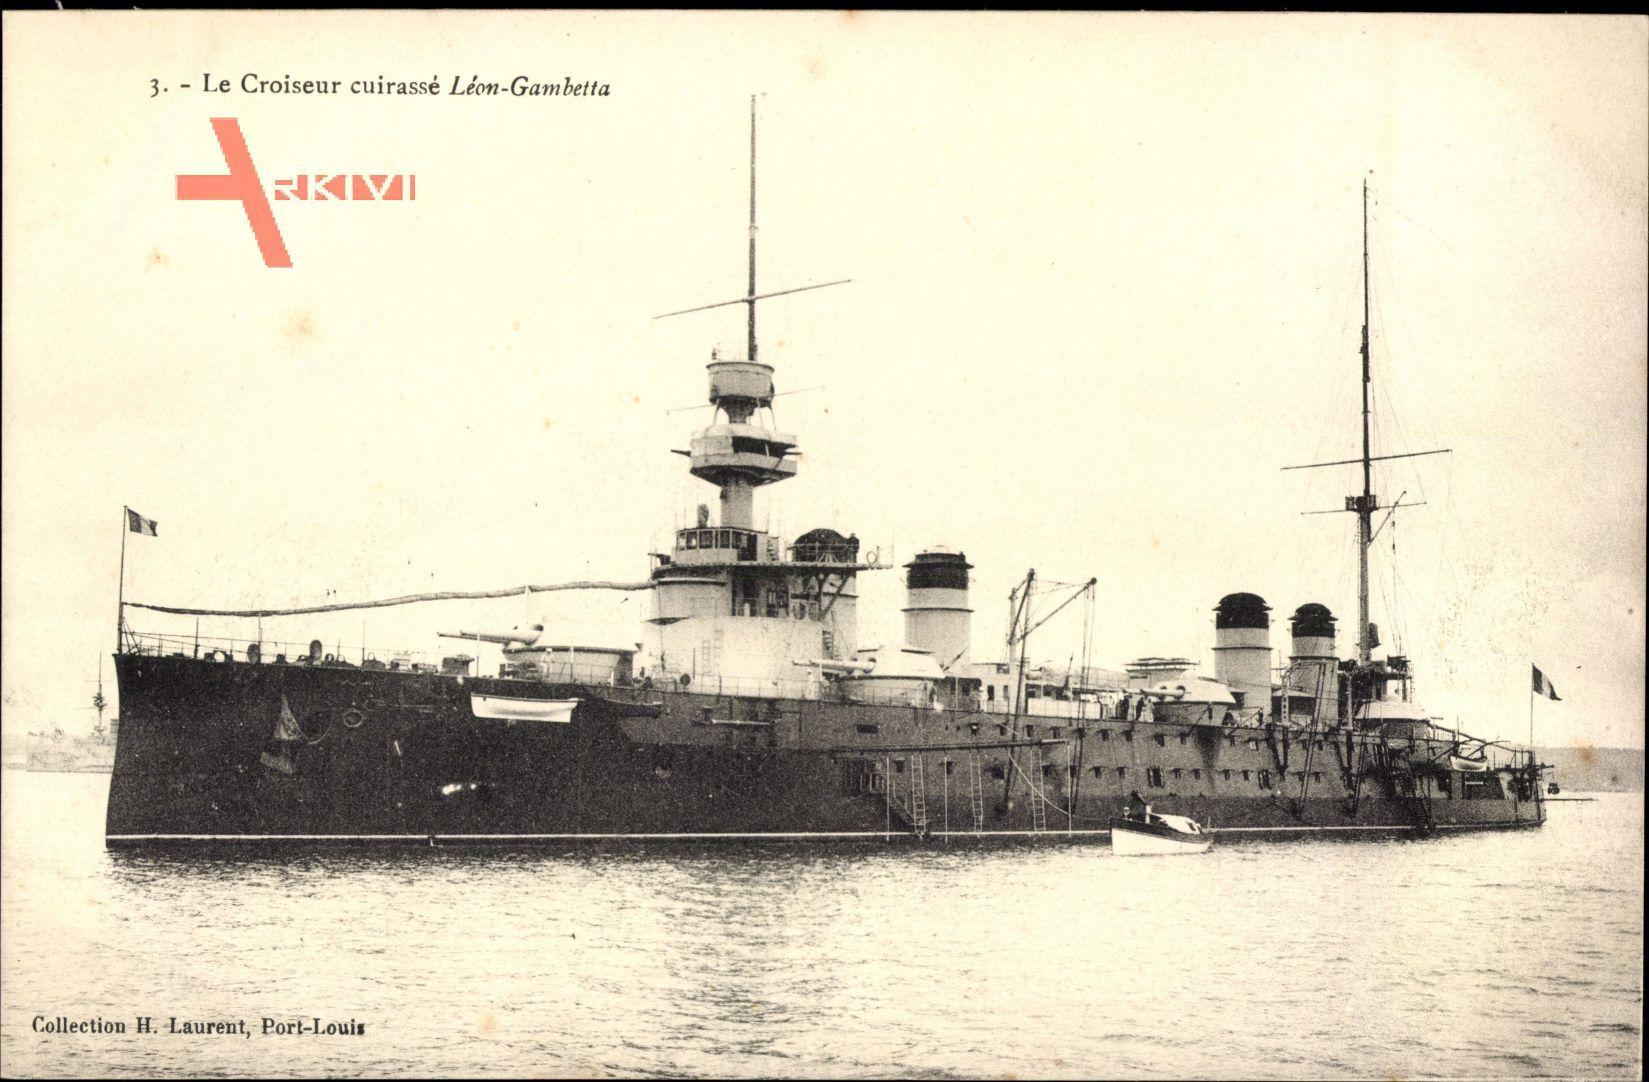 Französisches Kriegsschiff, Croiseur cuirassé Léon Gambetta